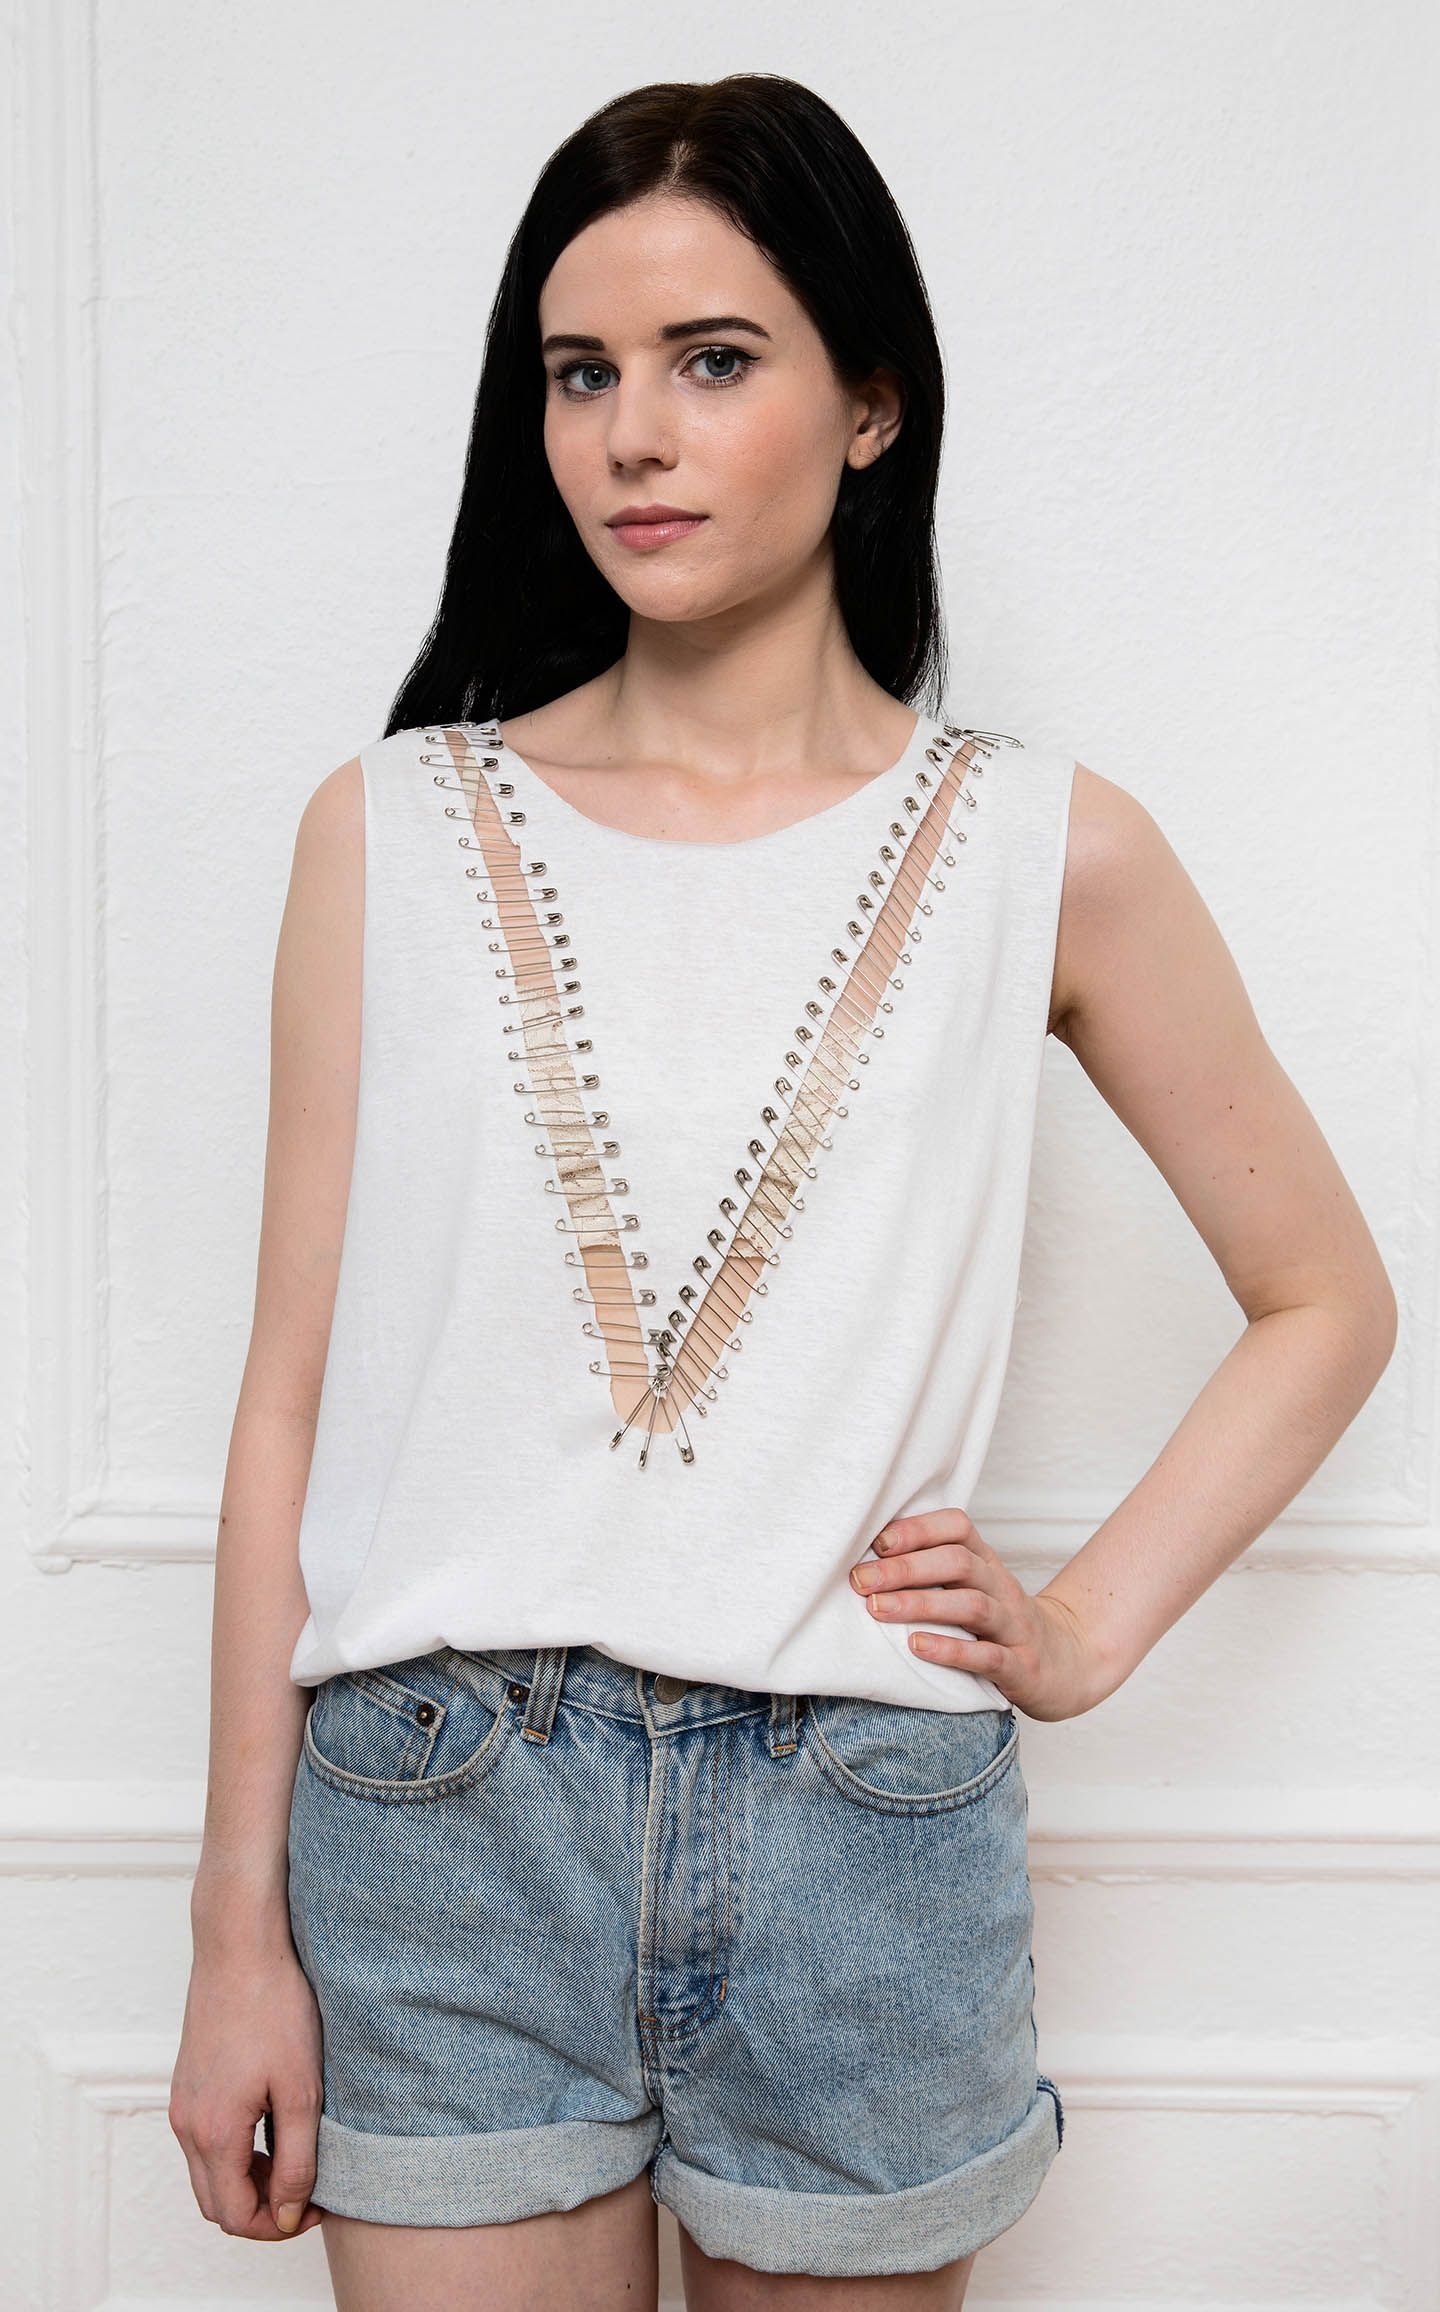 fd0d30ec4 Aug 8 Easy DIY Safety Pin Shirt   • BON FEMMES FASHION •   Diy shirt ...